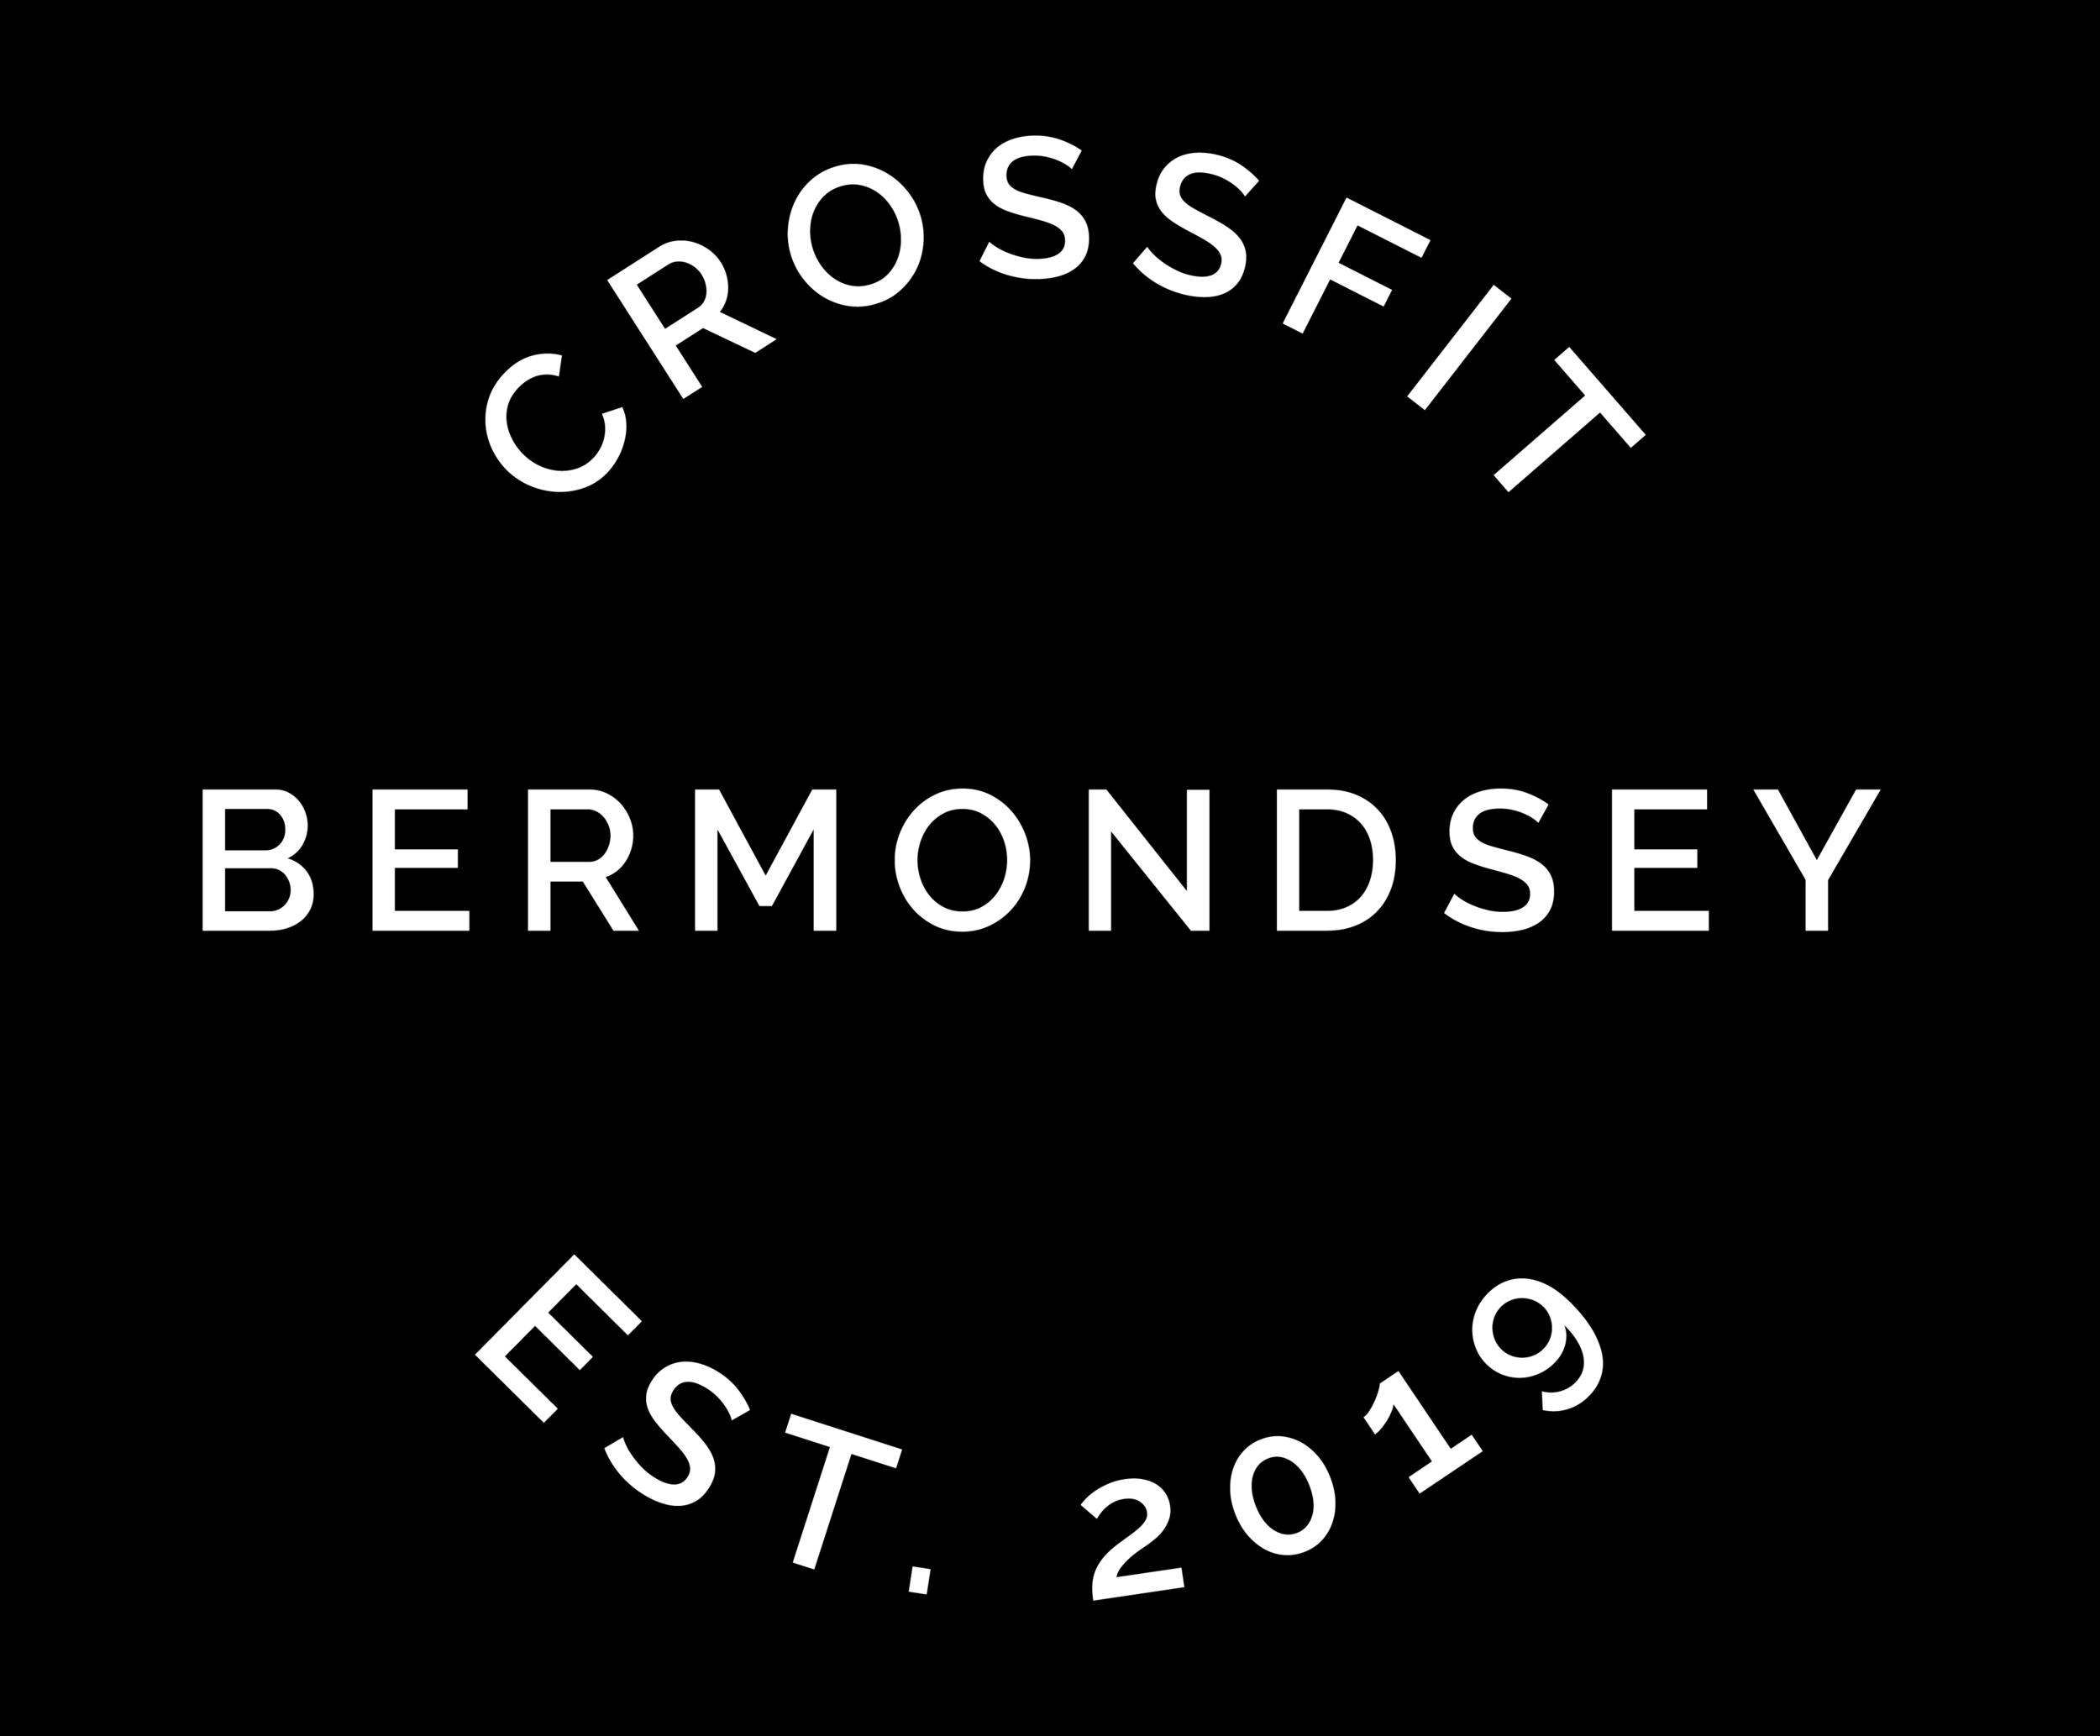 CrossFit Bermondsey